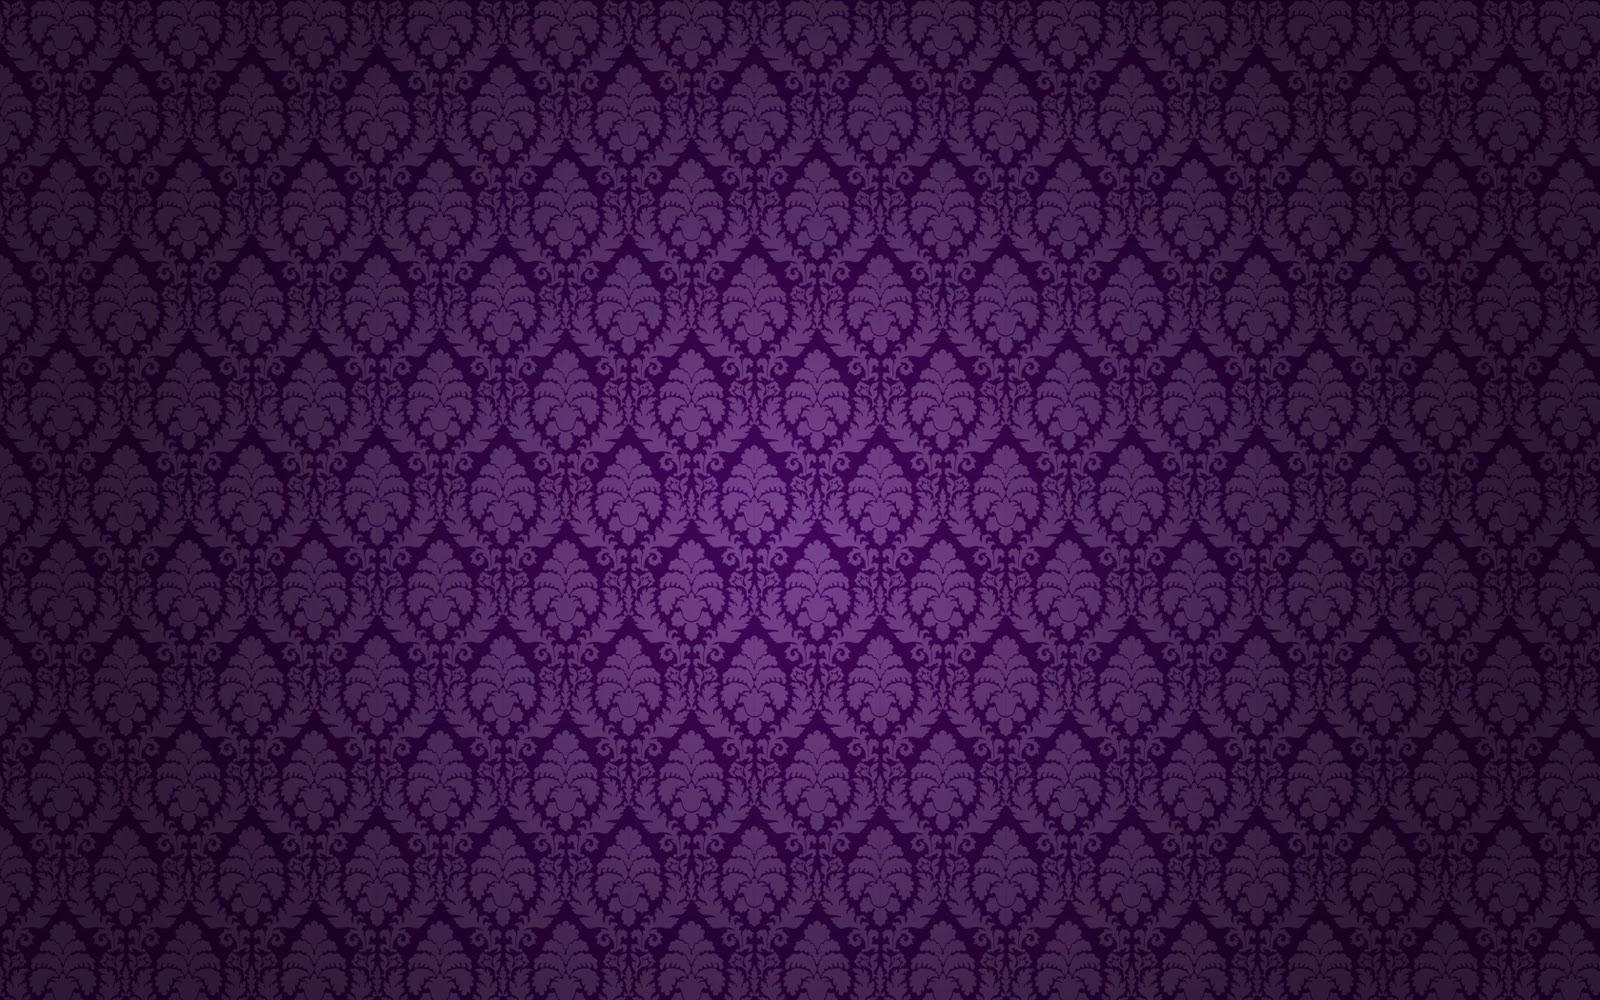 HD Wallpapers Desktop Purple Background HD DeskTop Wallpapers 1600x1000